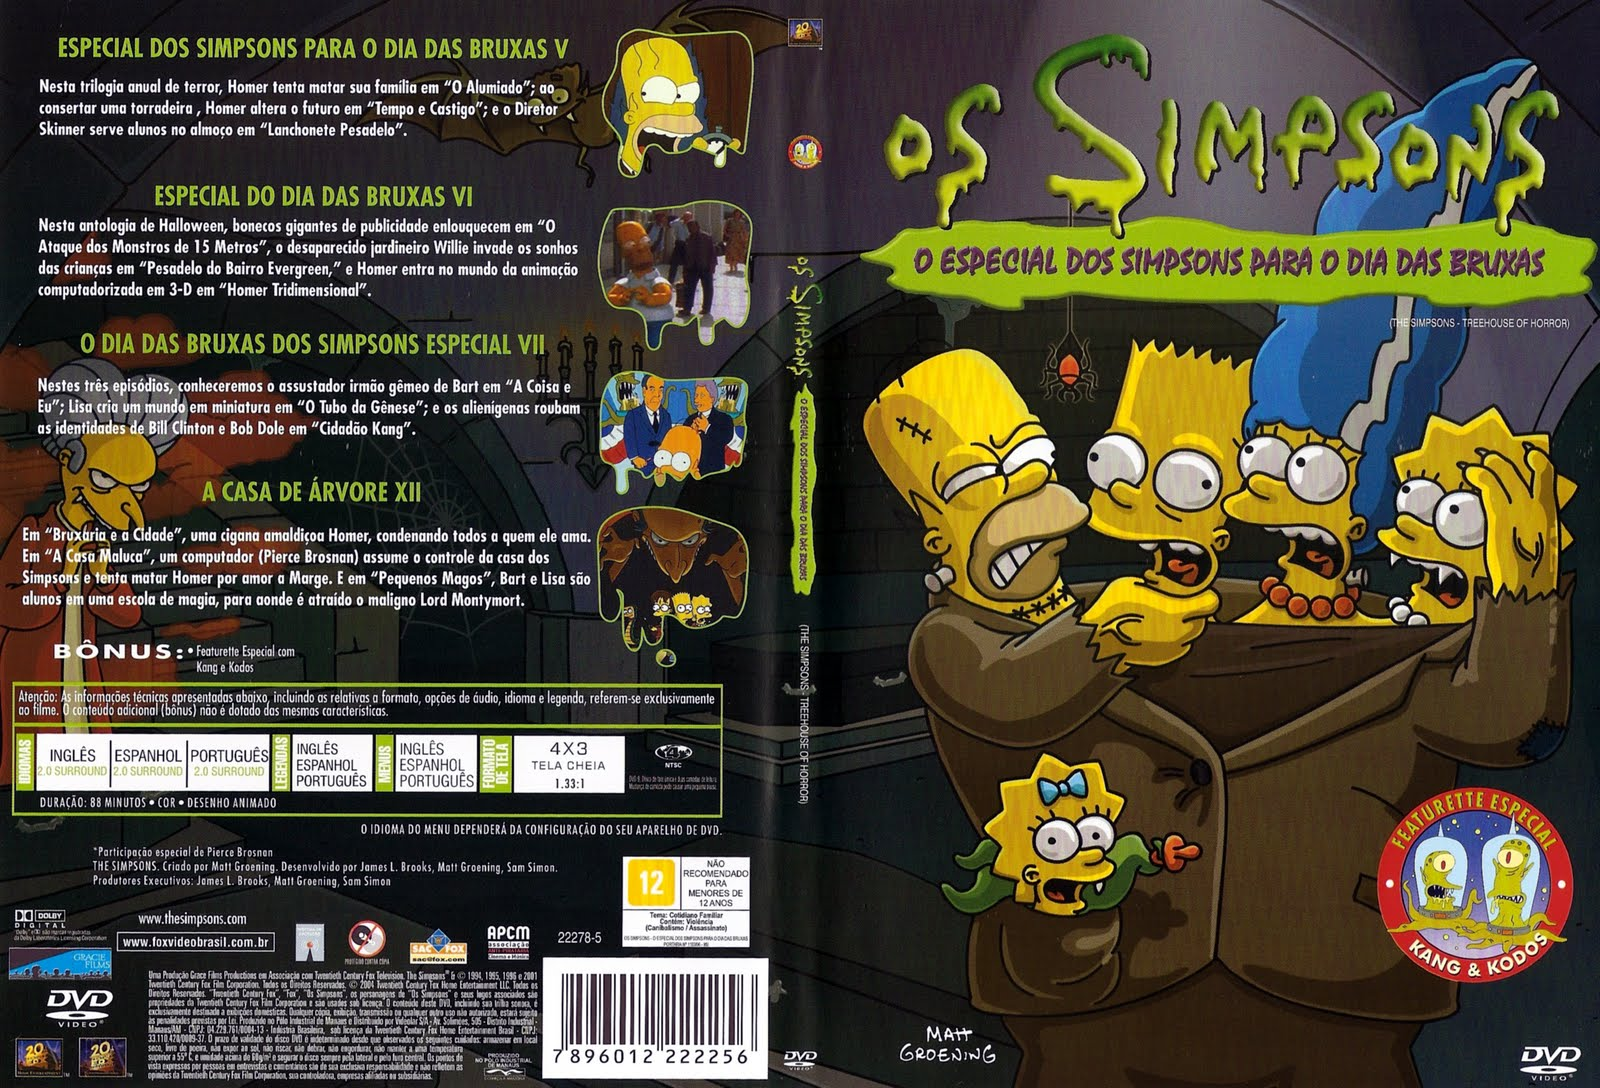 os simpsons 2 temporada online dating